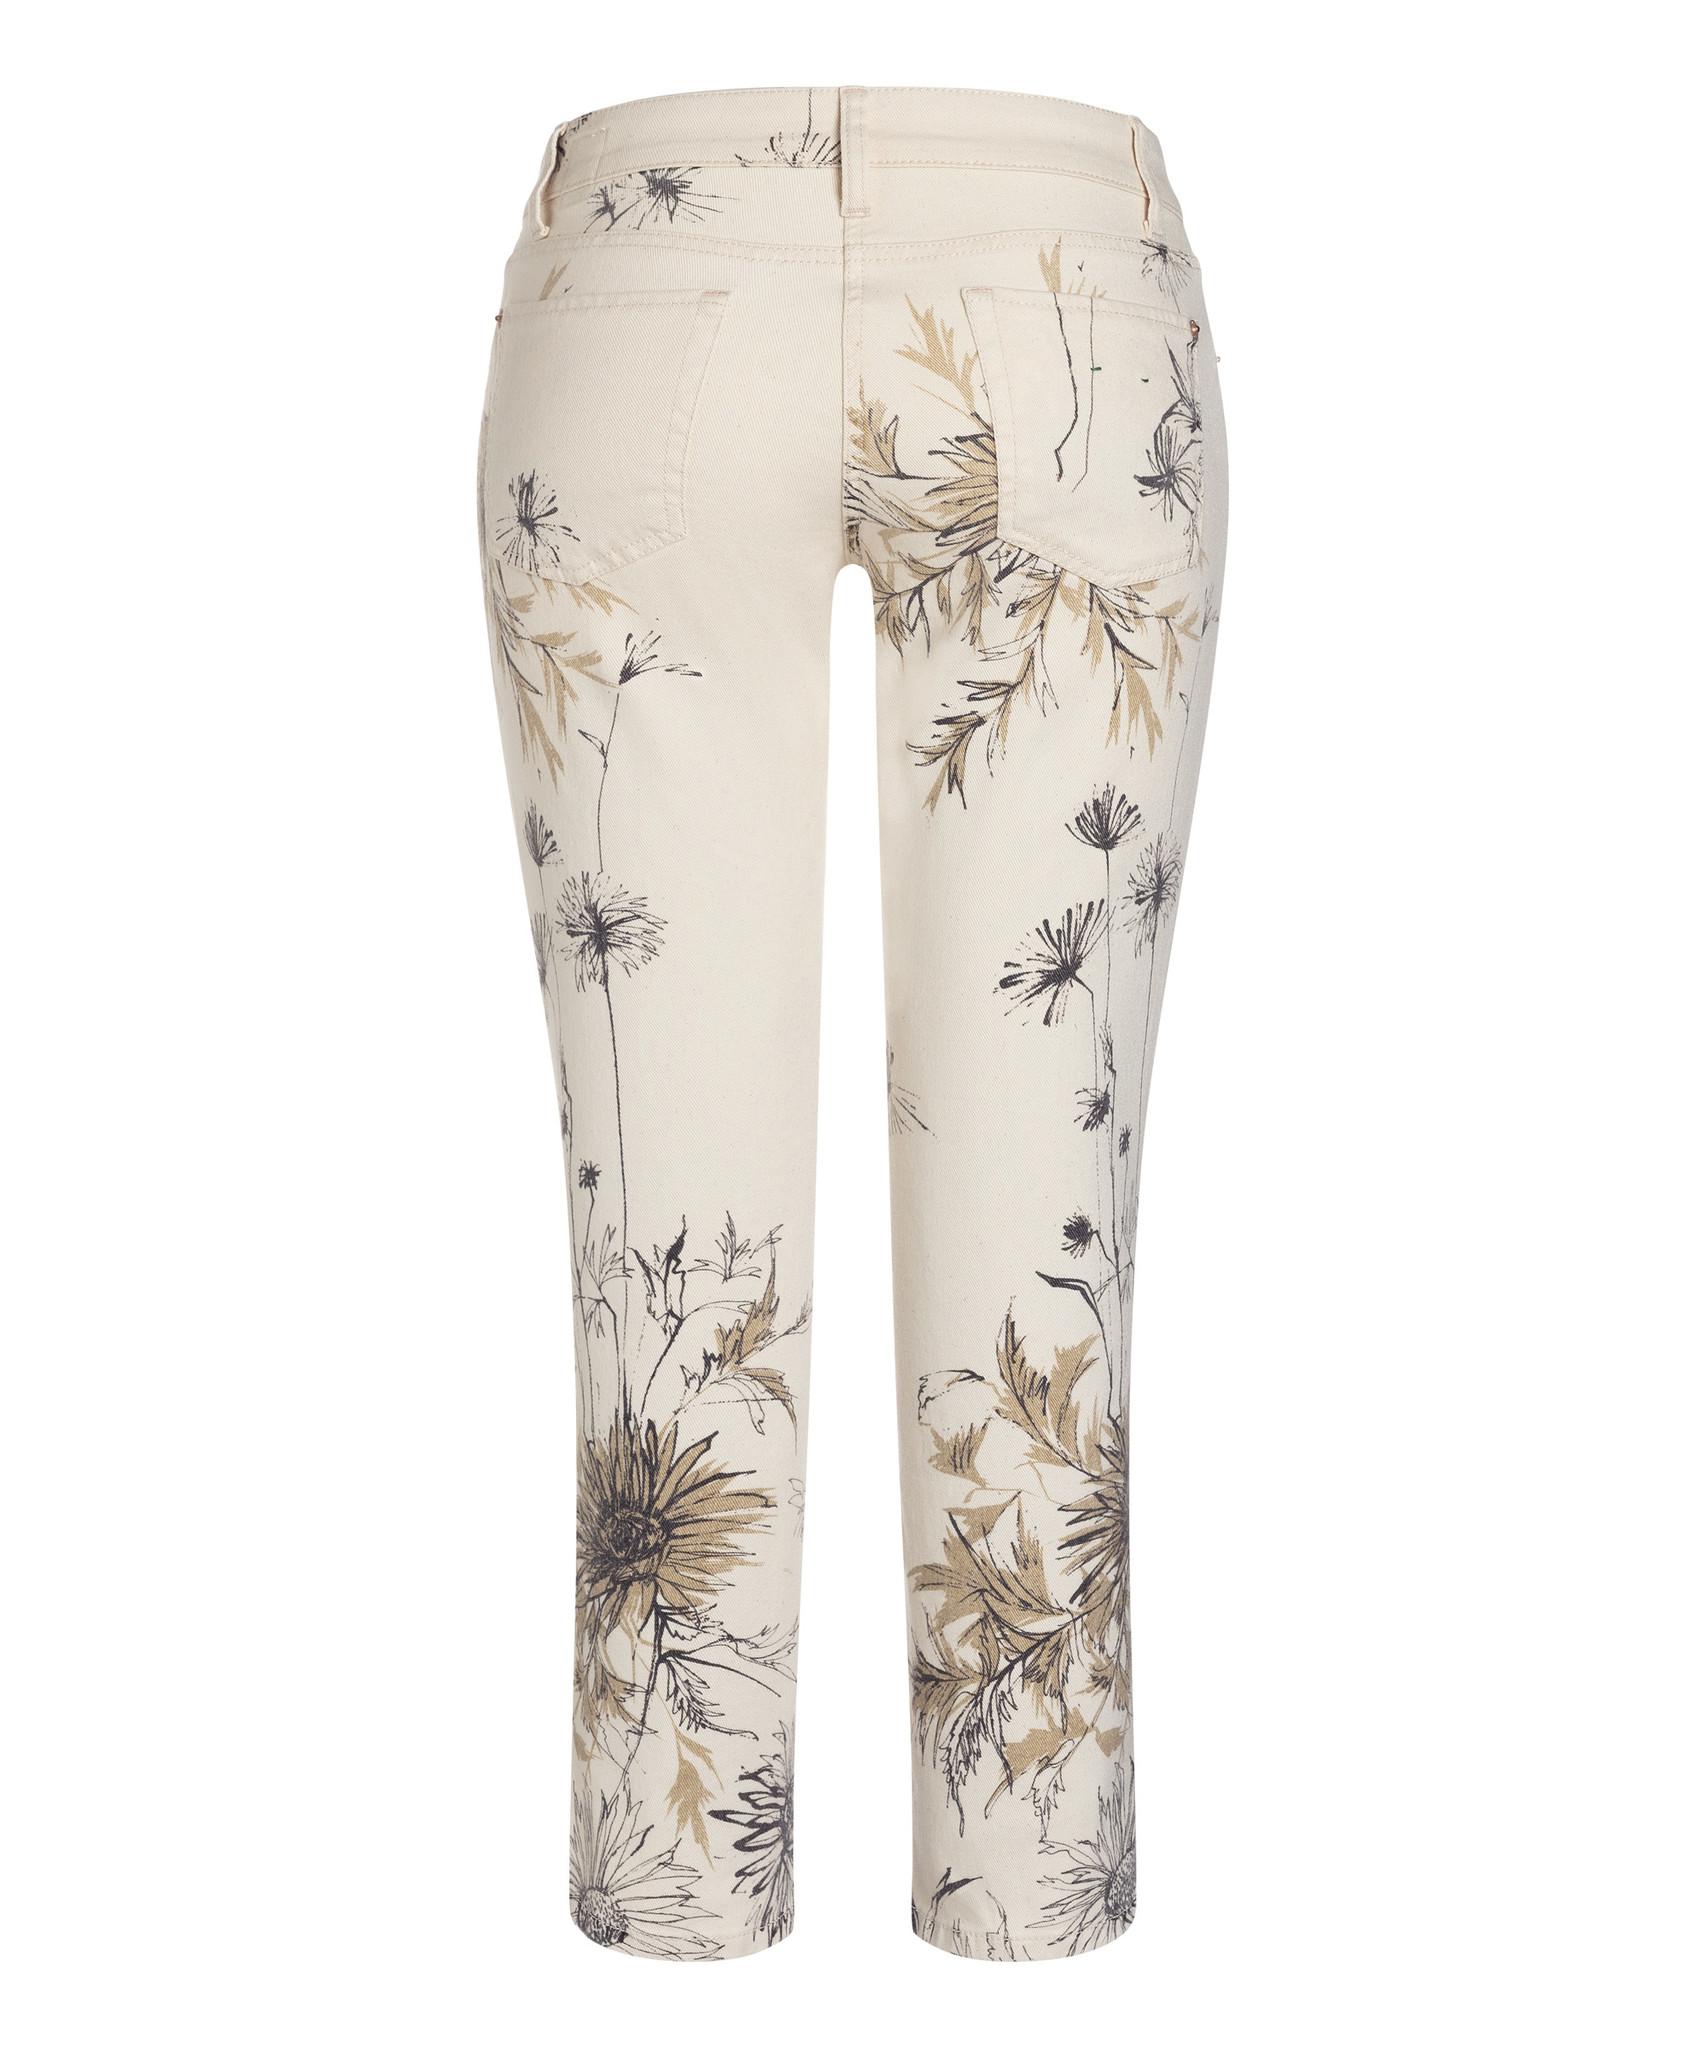 Cambio jeans 9758 TESS-3